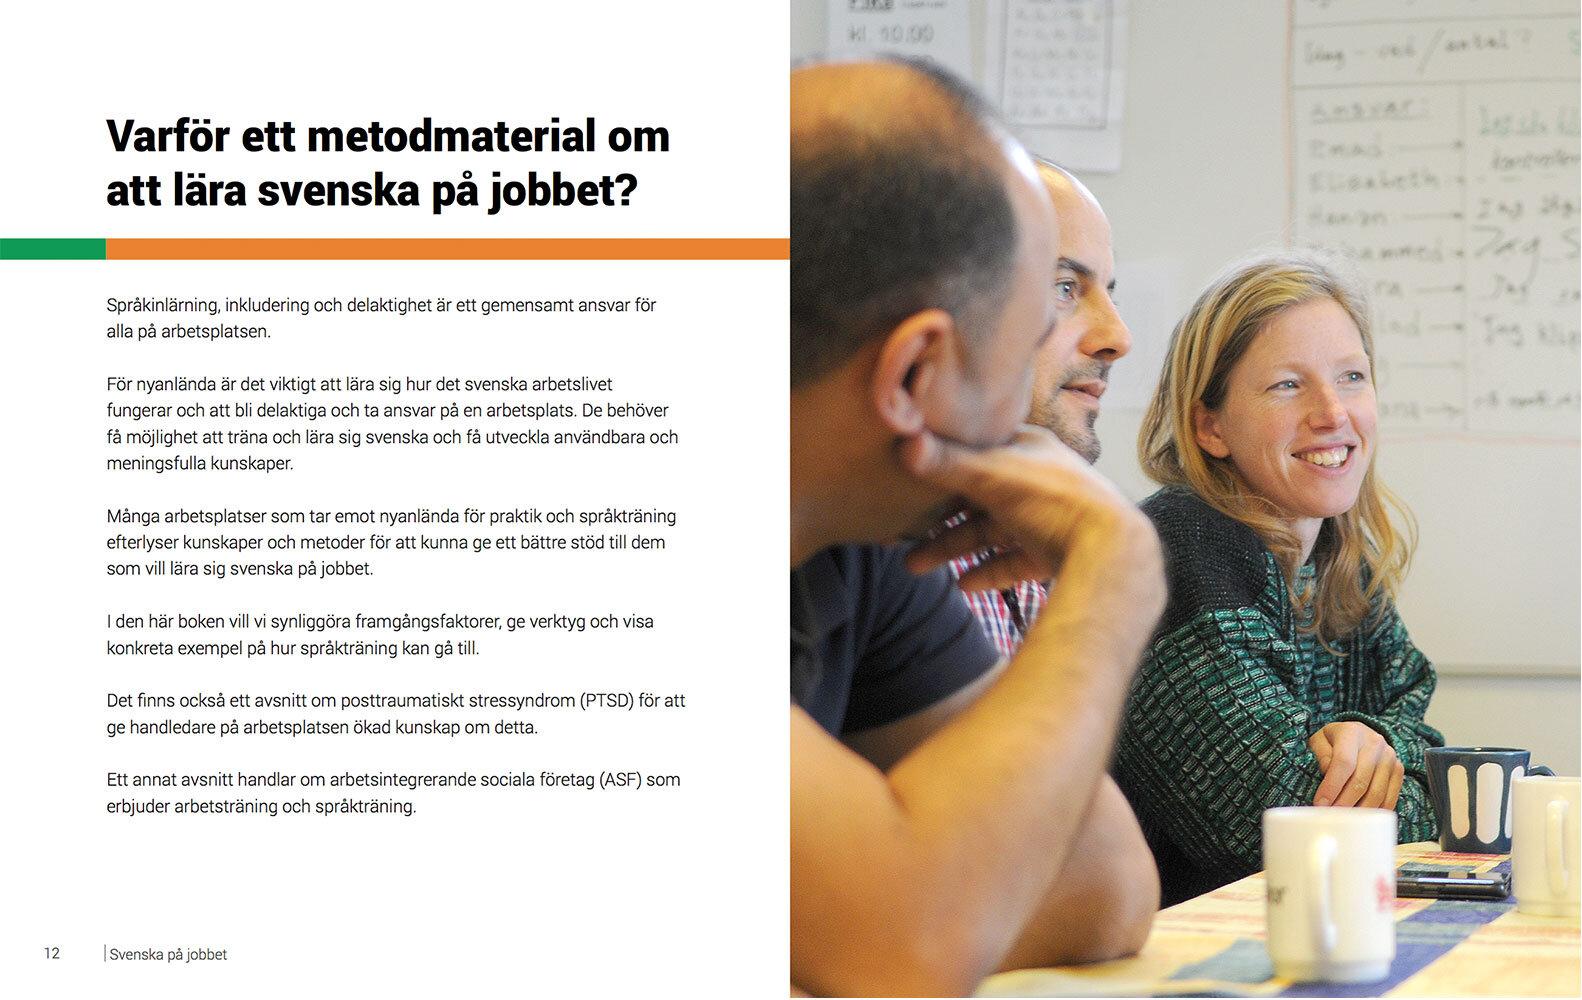 FS_Svenska-pa-jobbet_03.jpg